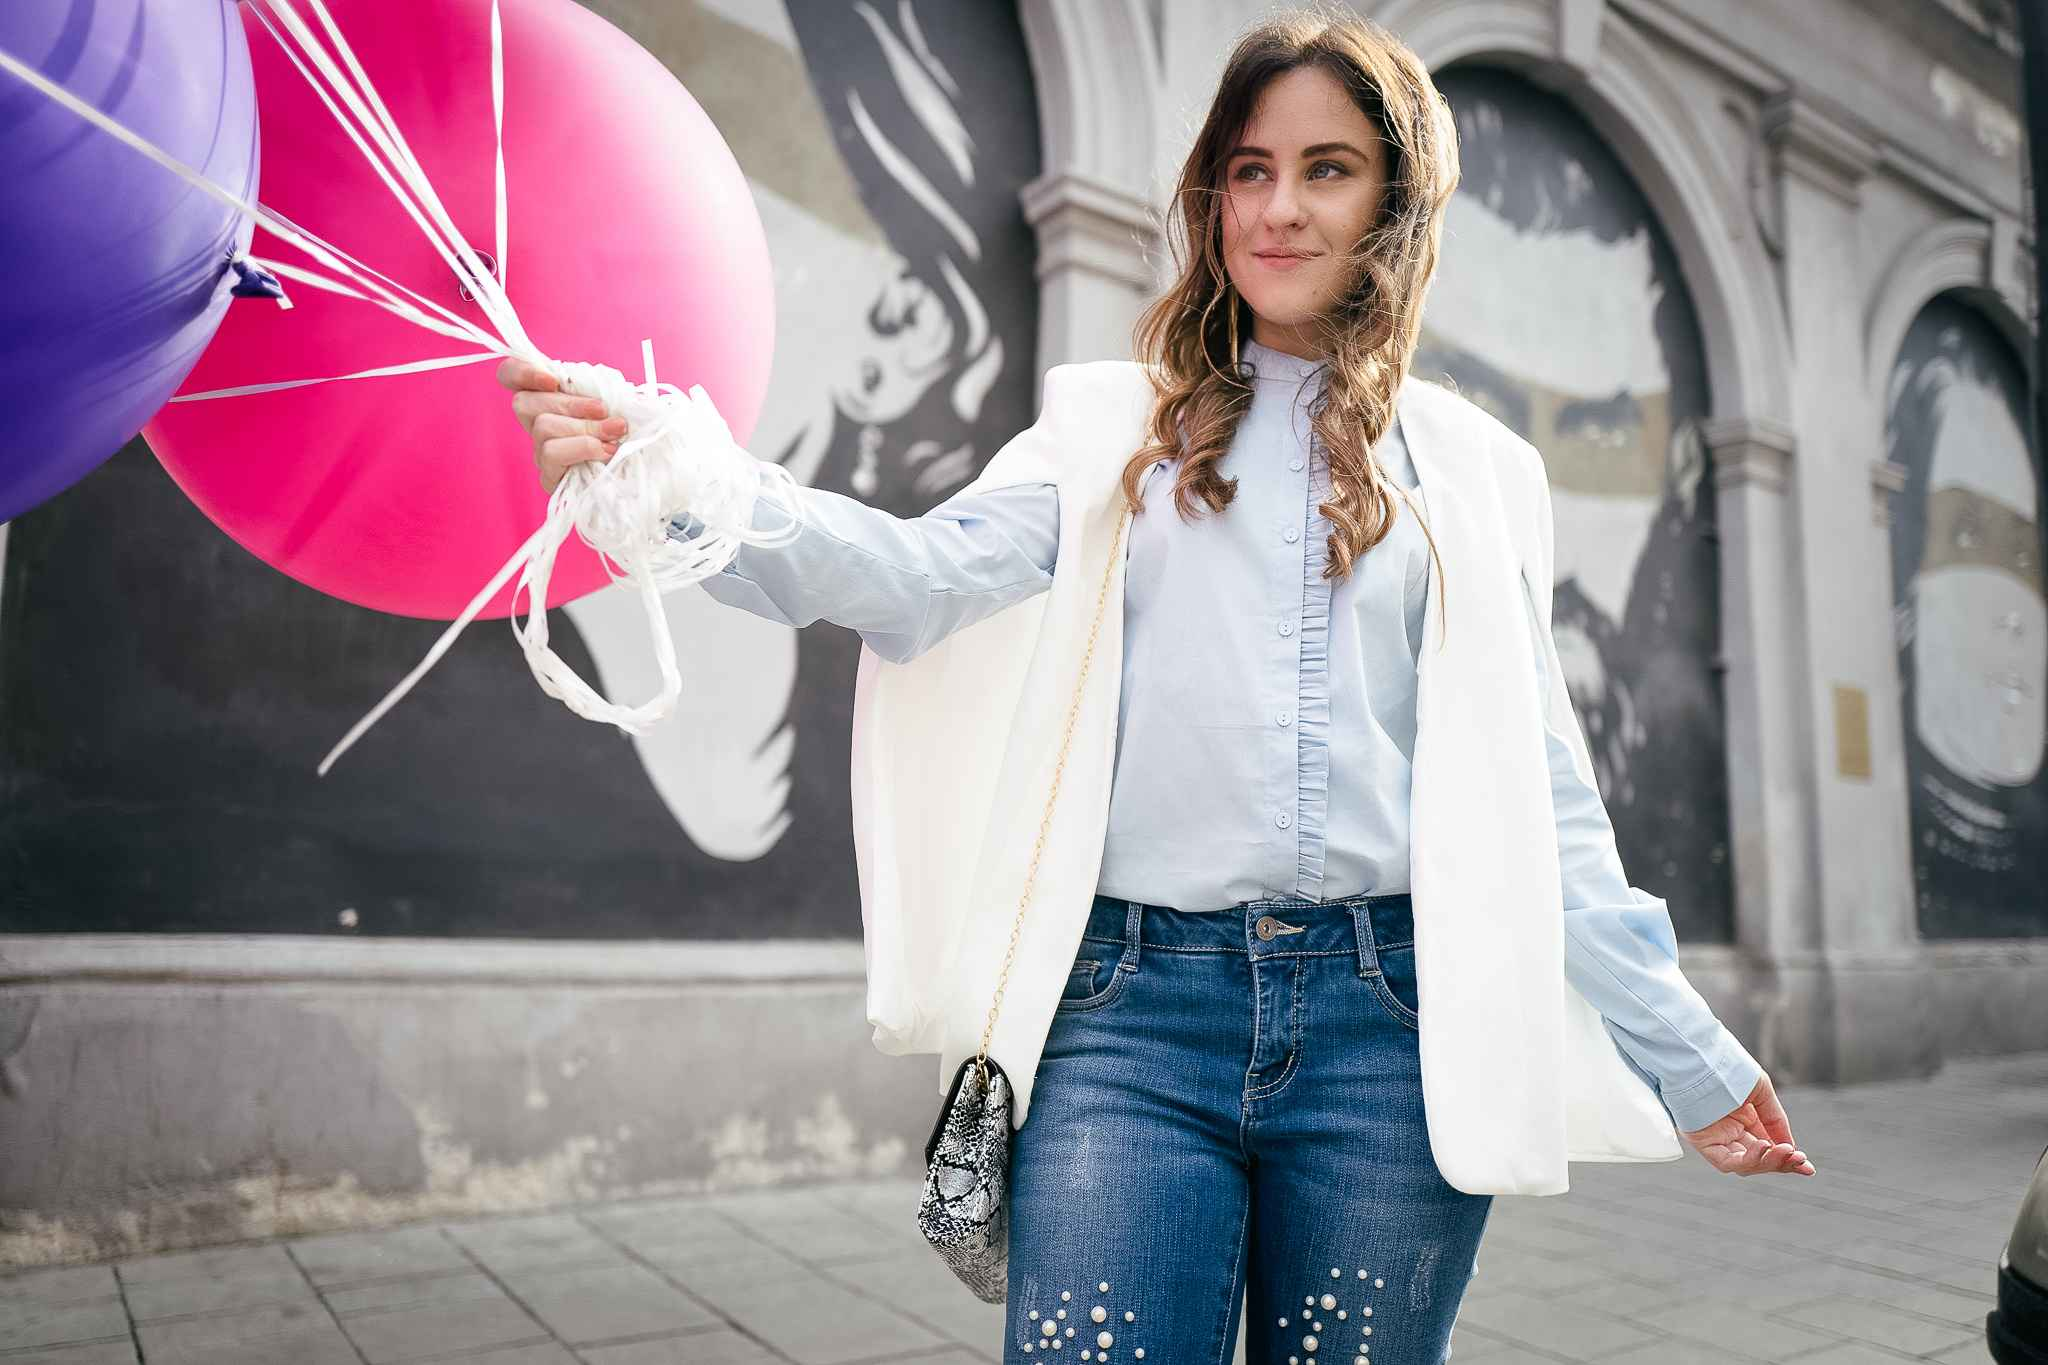 Bonprix Fashionblogger Krakau